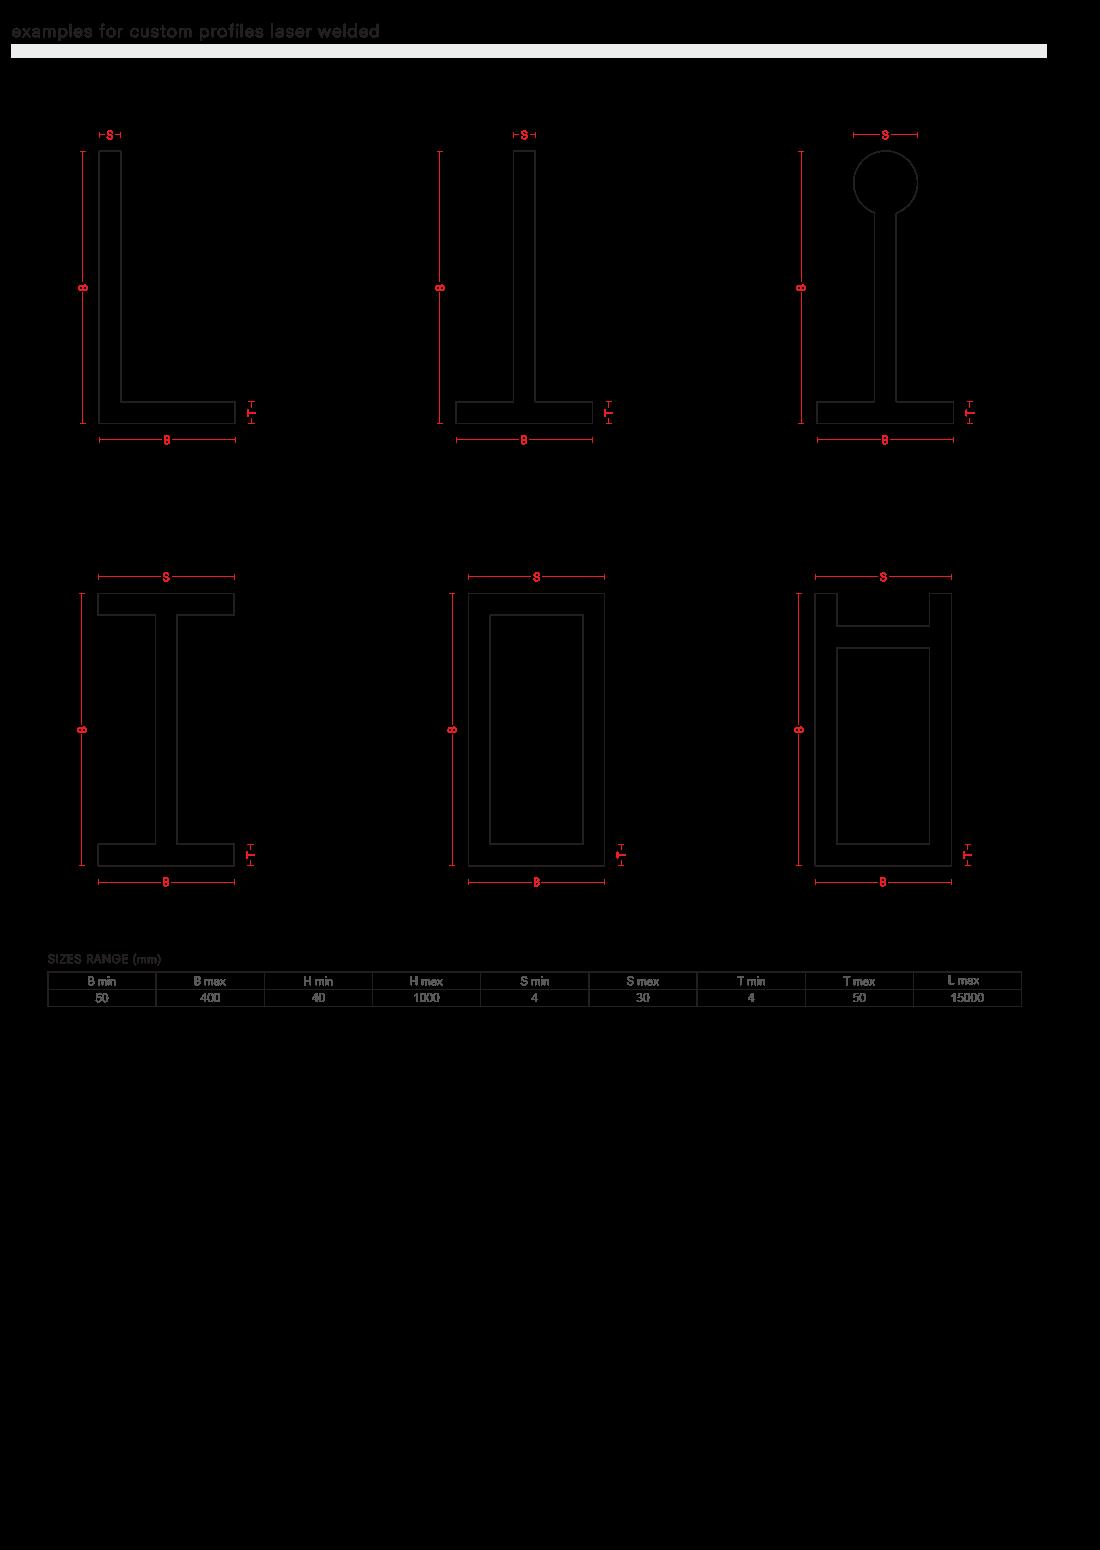 OS-TEC_profile-range